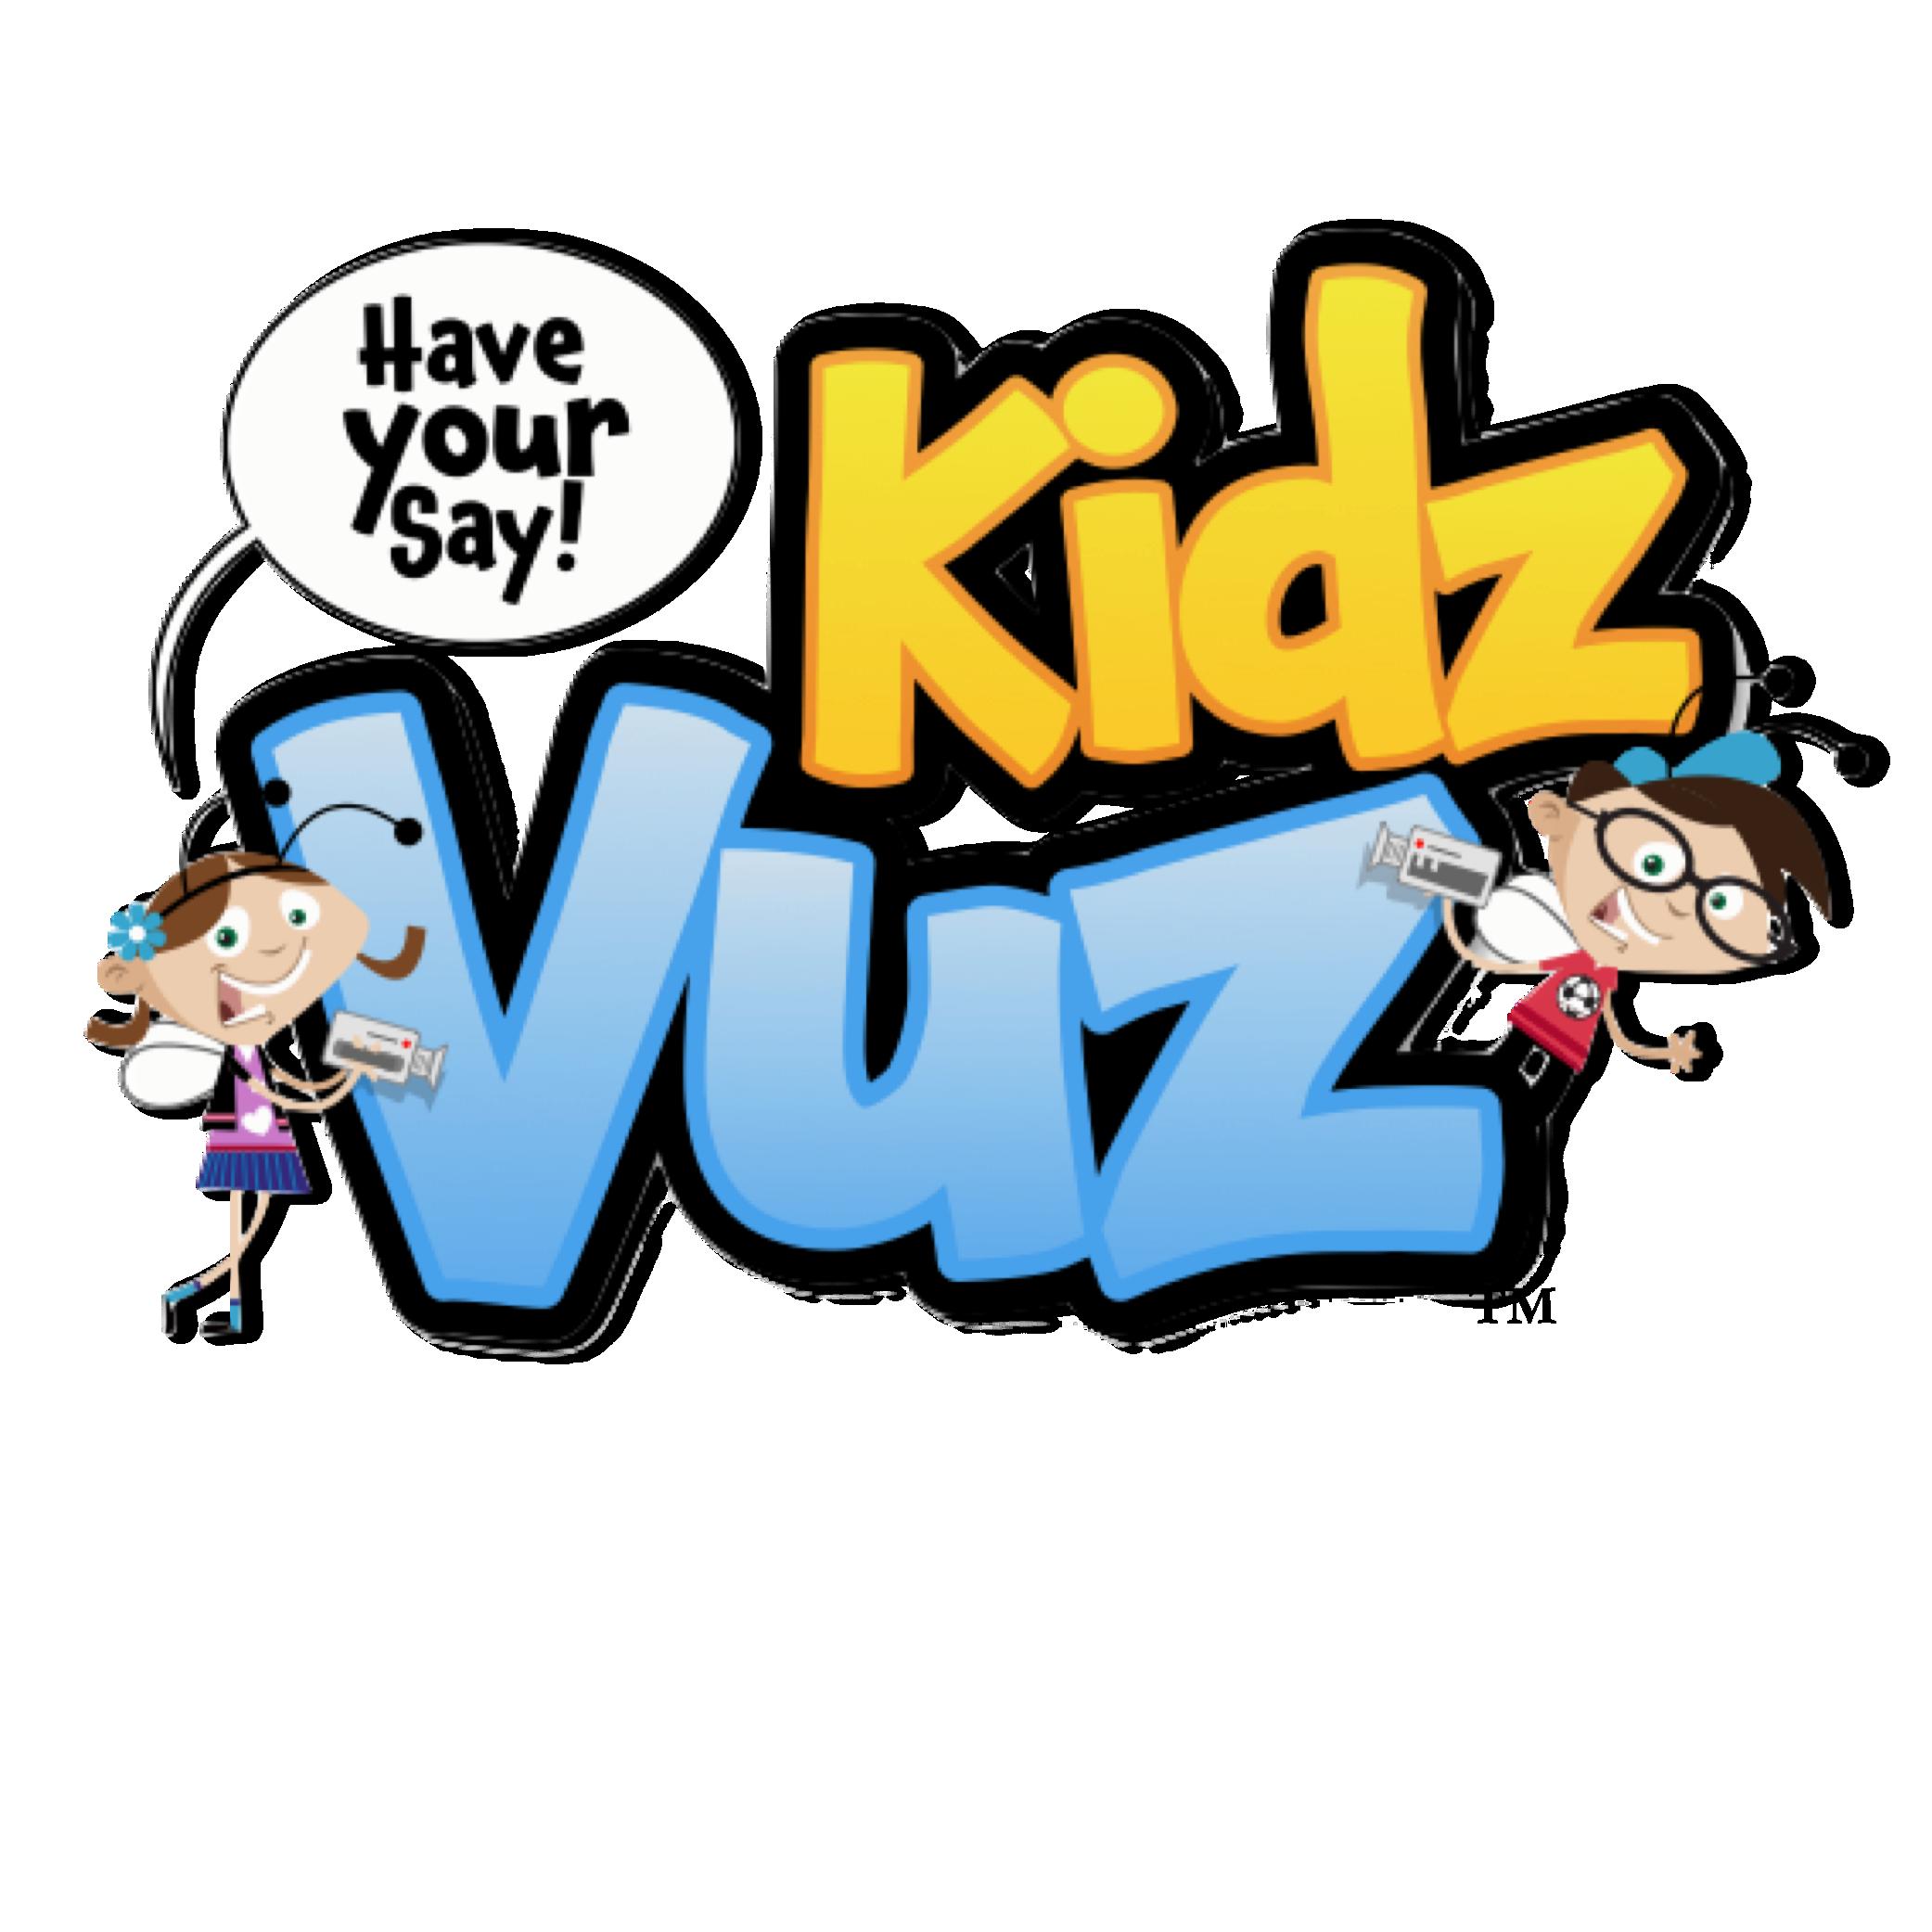 Back to school bash clipart clipart royalty free library KidzVuz | DaDa Rocks! clipart royalty free library